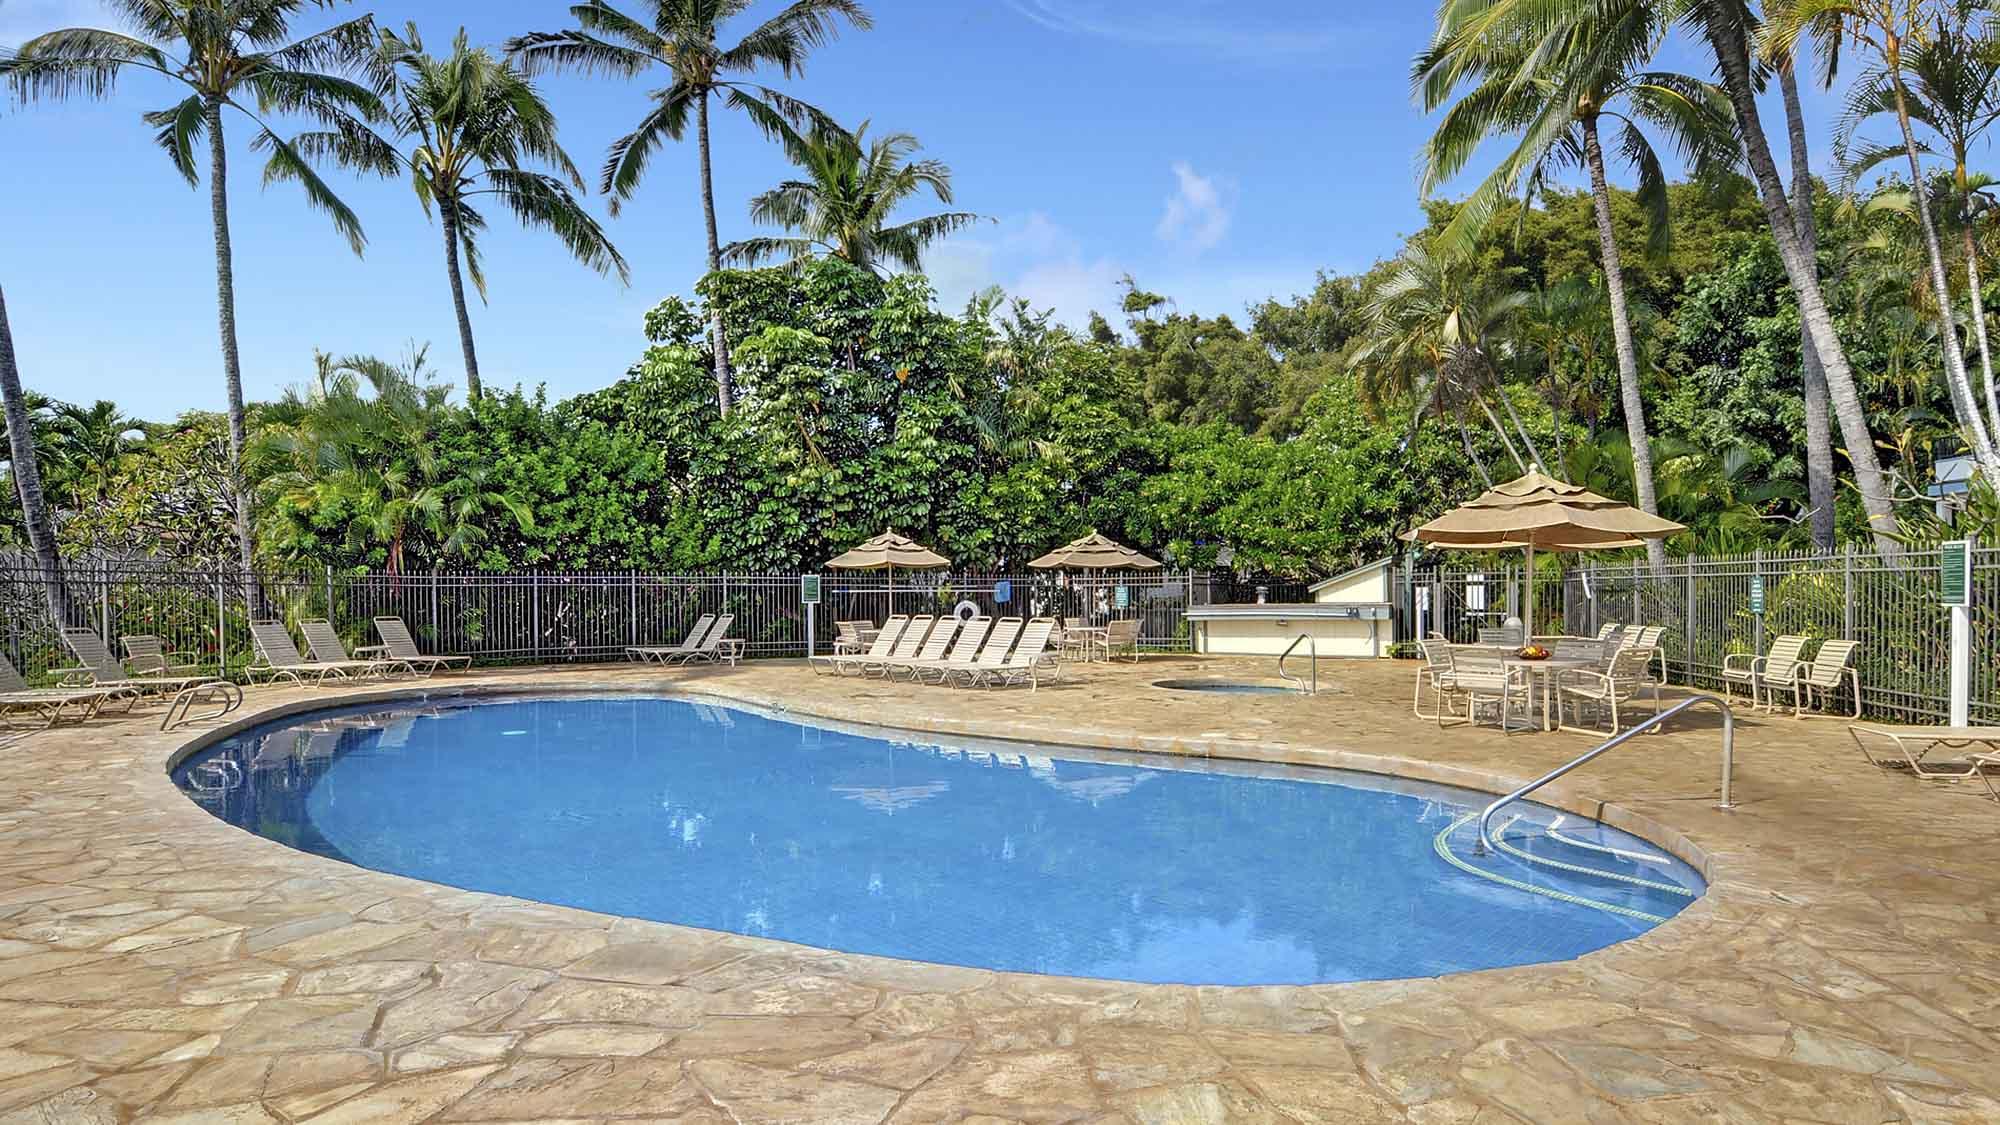 Poipu Kai Resort - Community Pool - Parrish Kauai